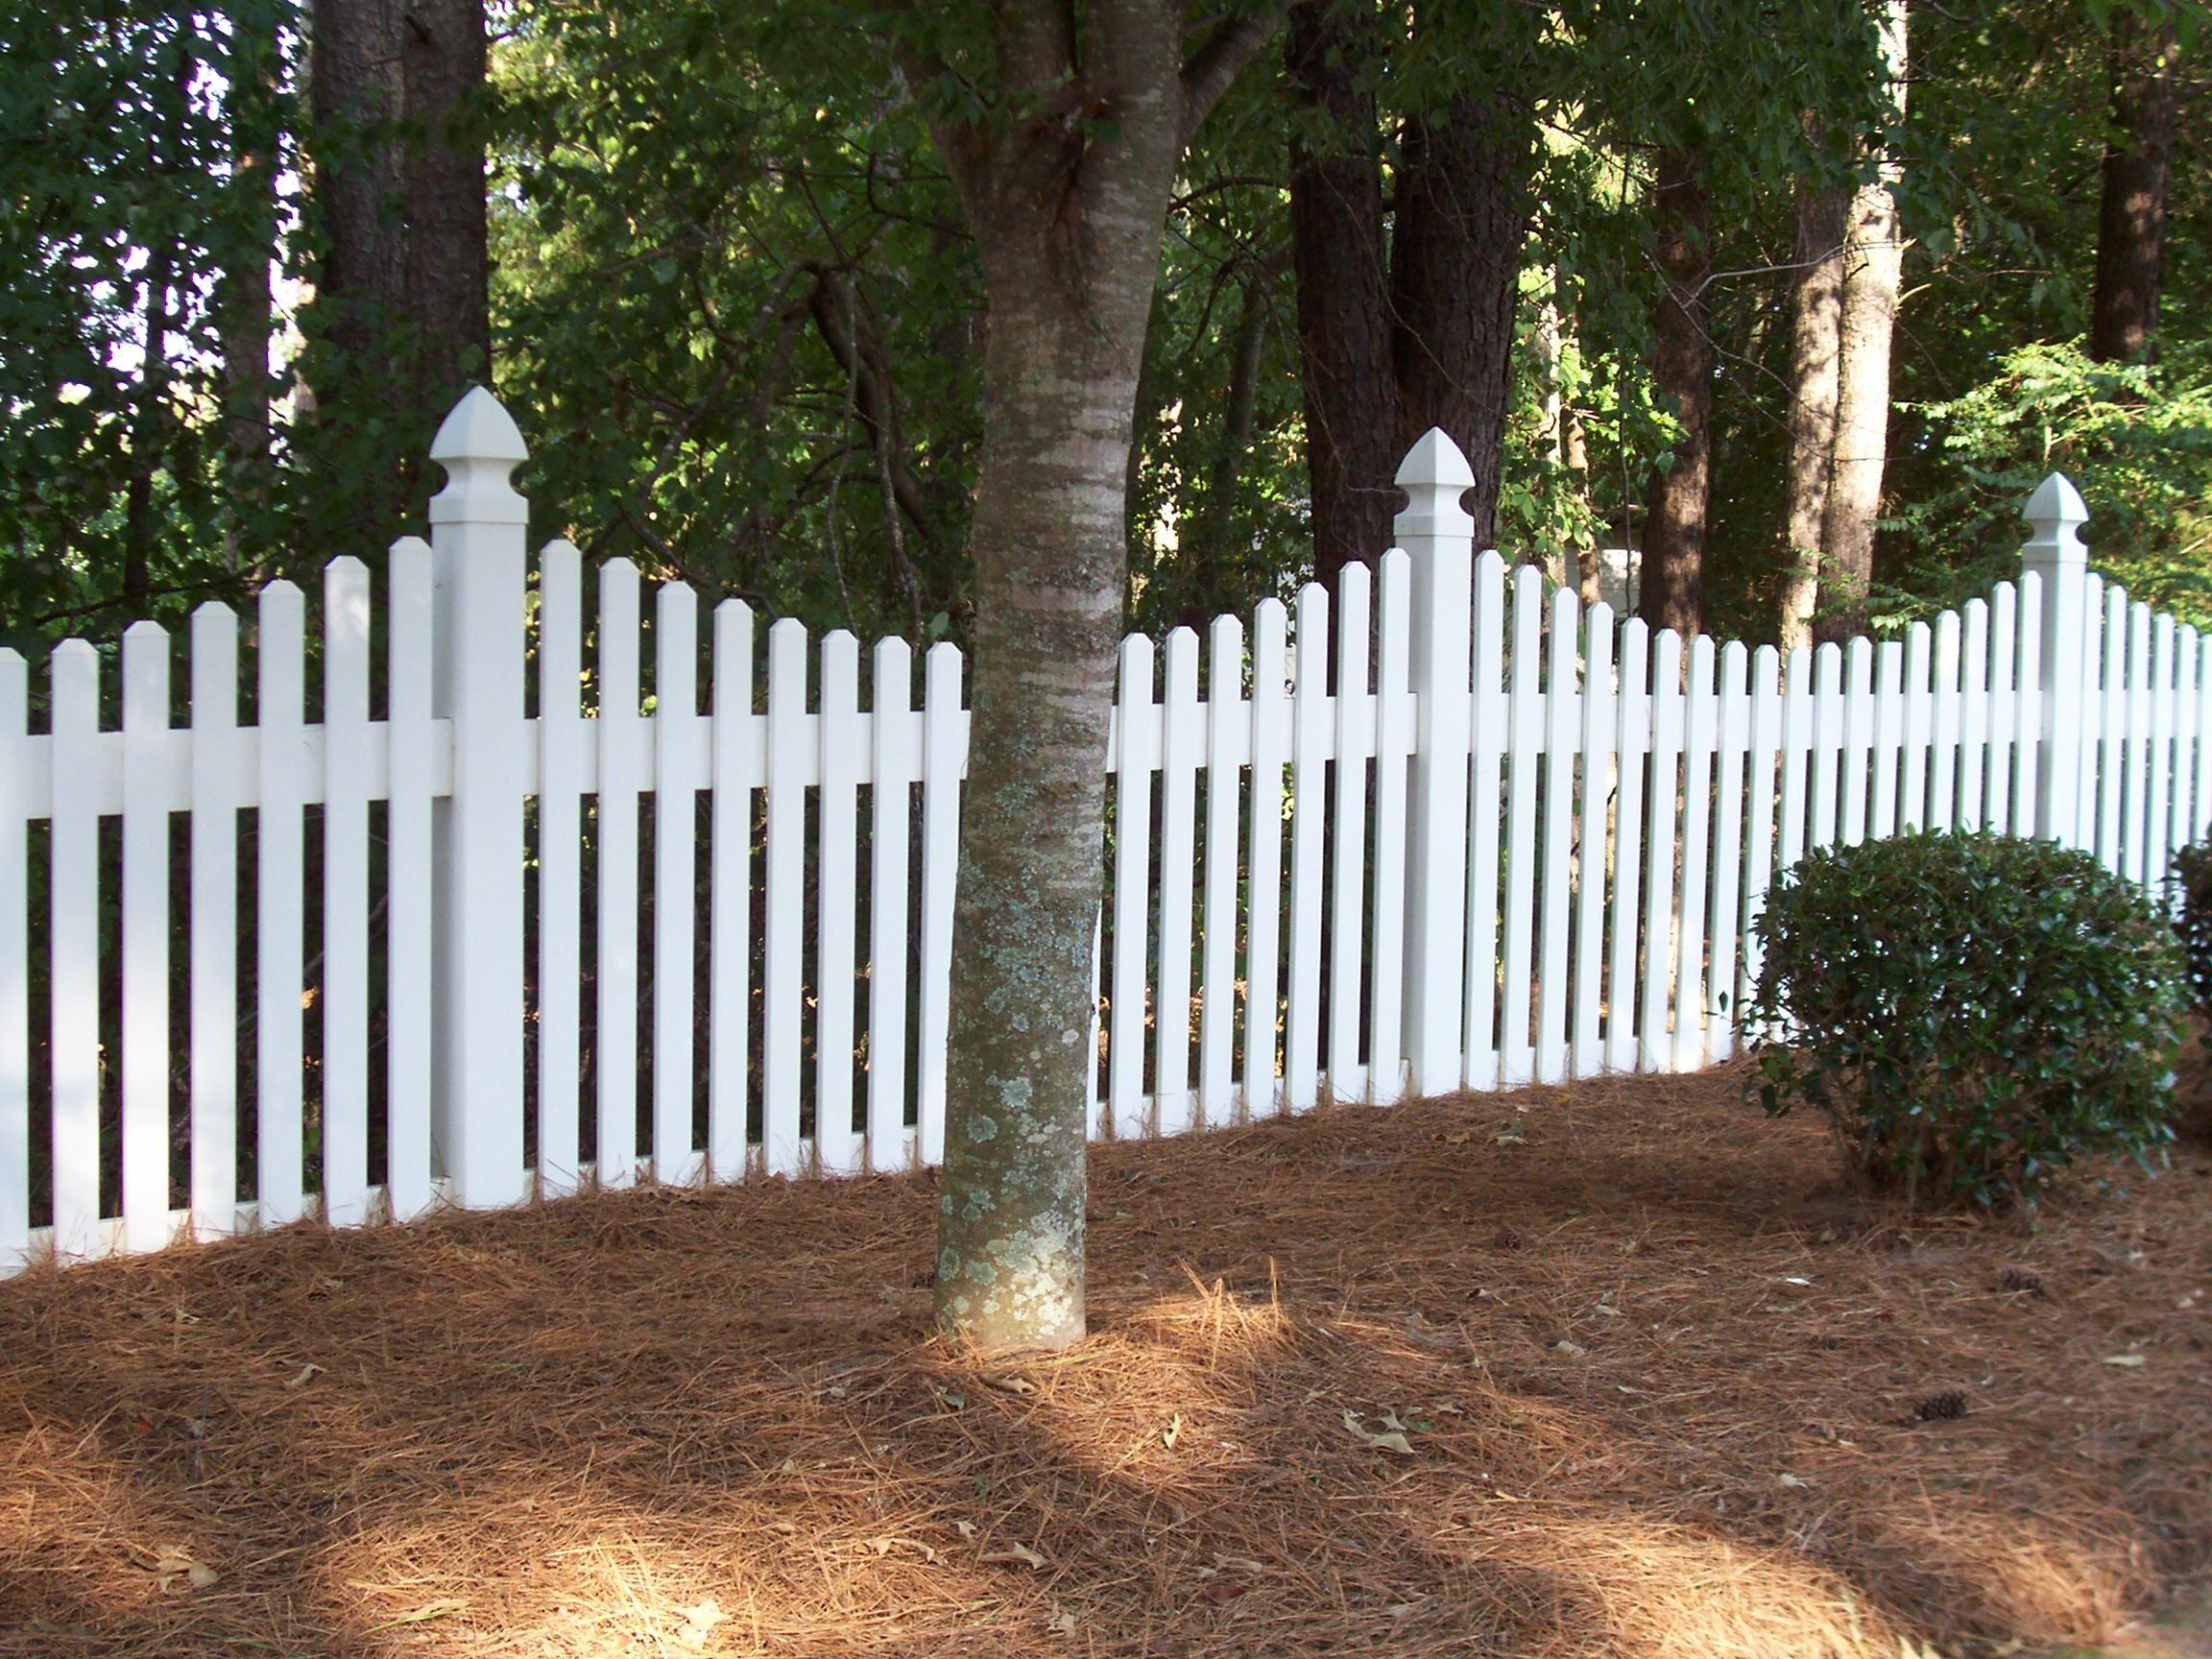 Monroe saddle cut white vinyl picket fence by mossy oak fence monroe saddle cut white vinyl picket fence by mossy oak fence located in orlando and baanklon Gallery